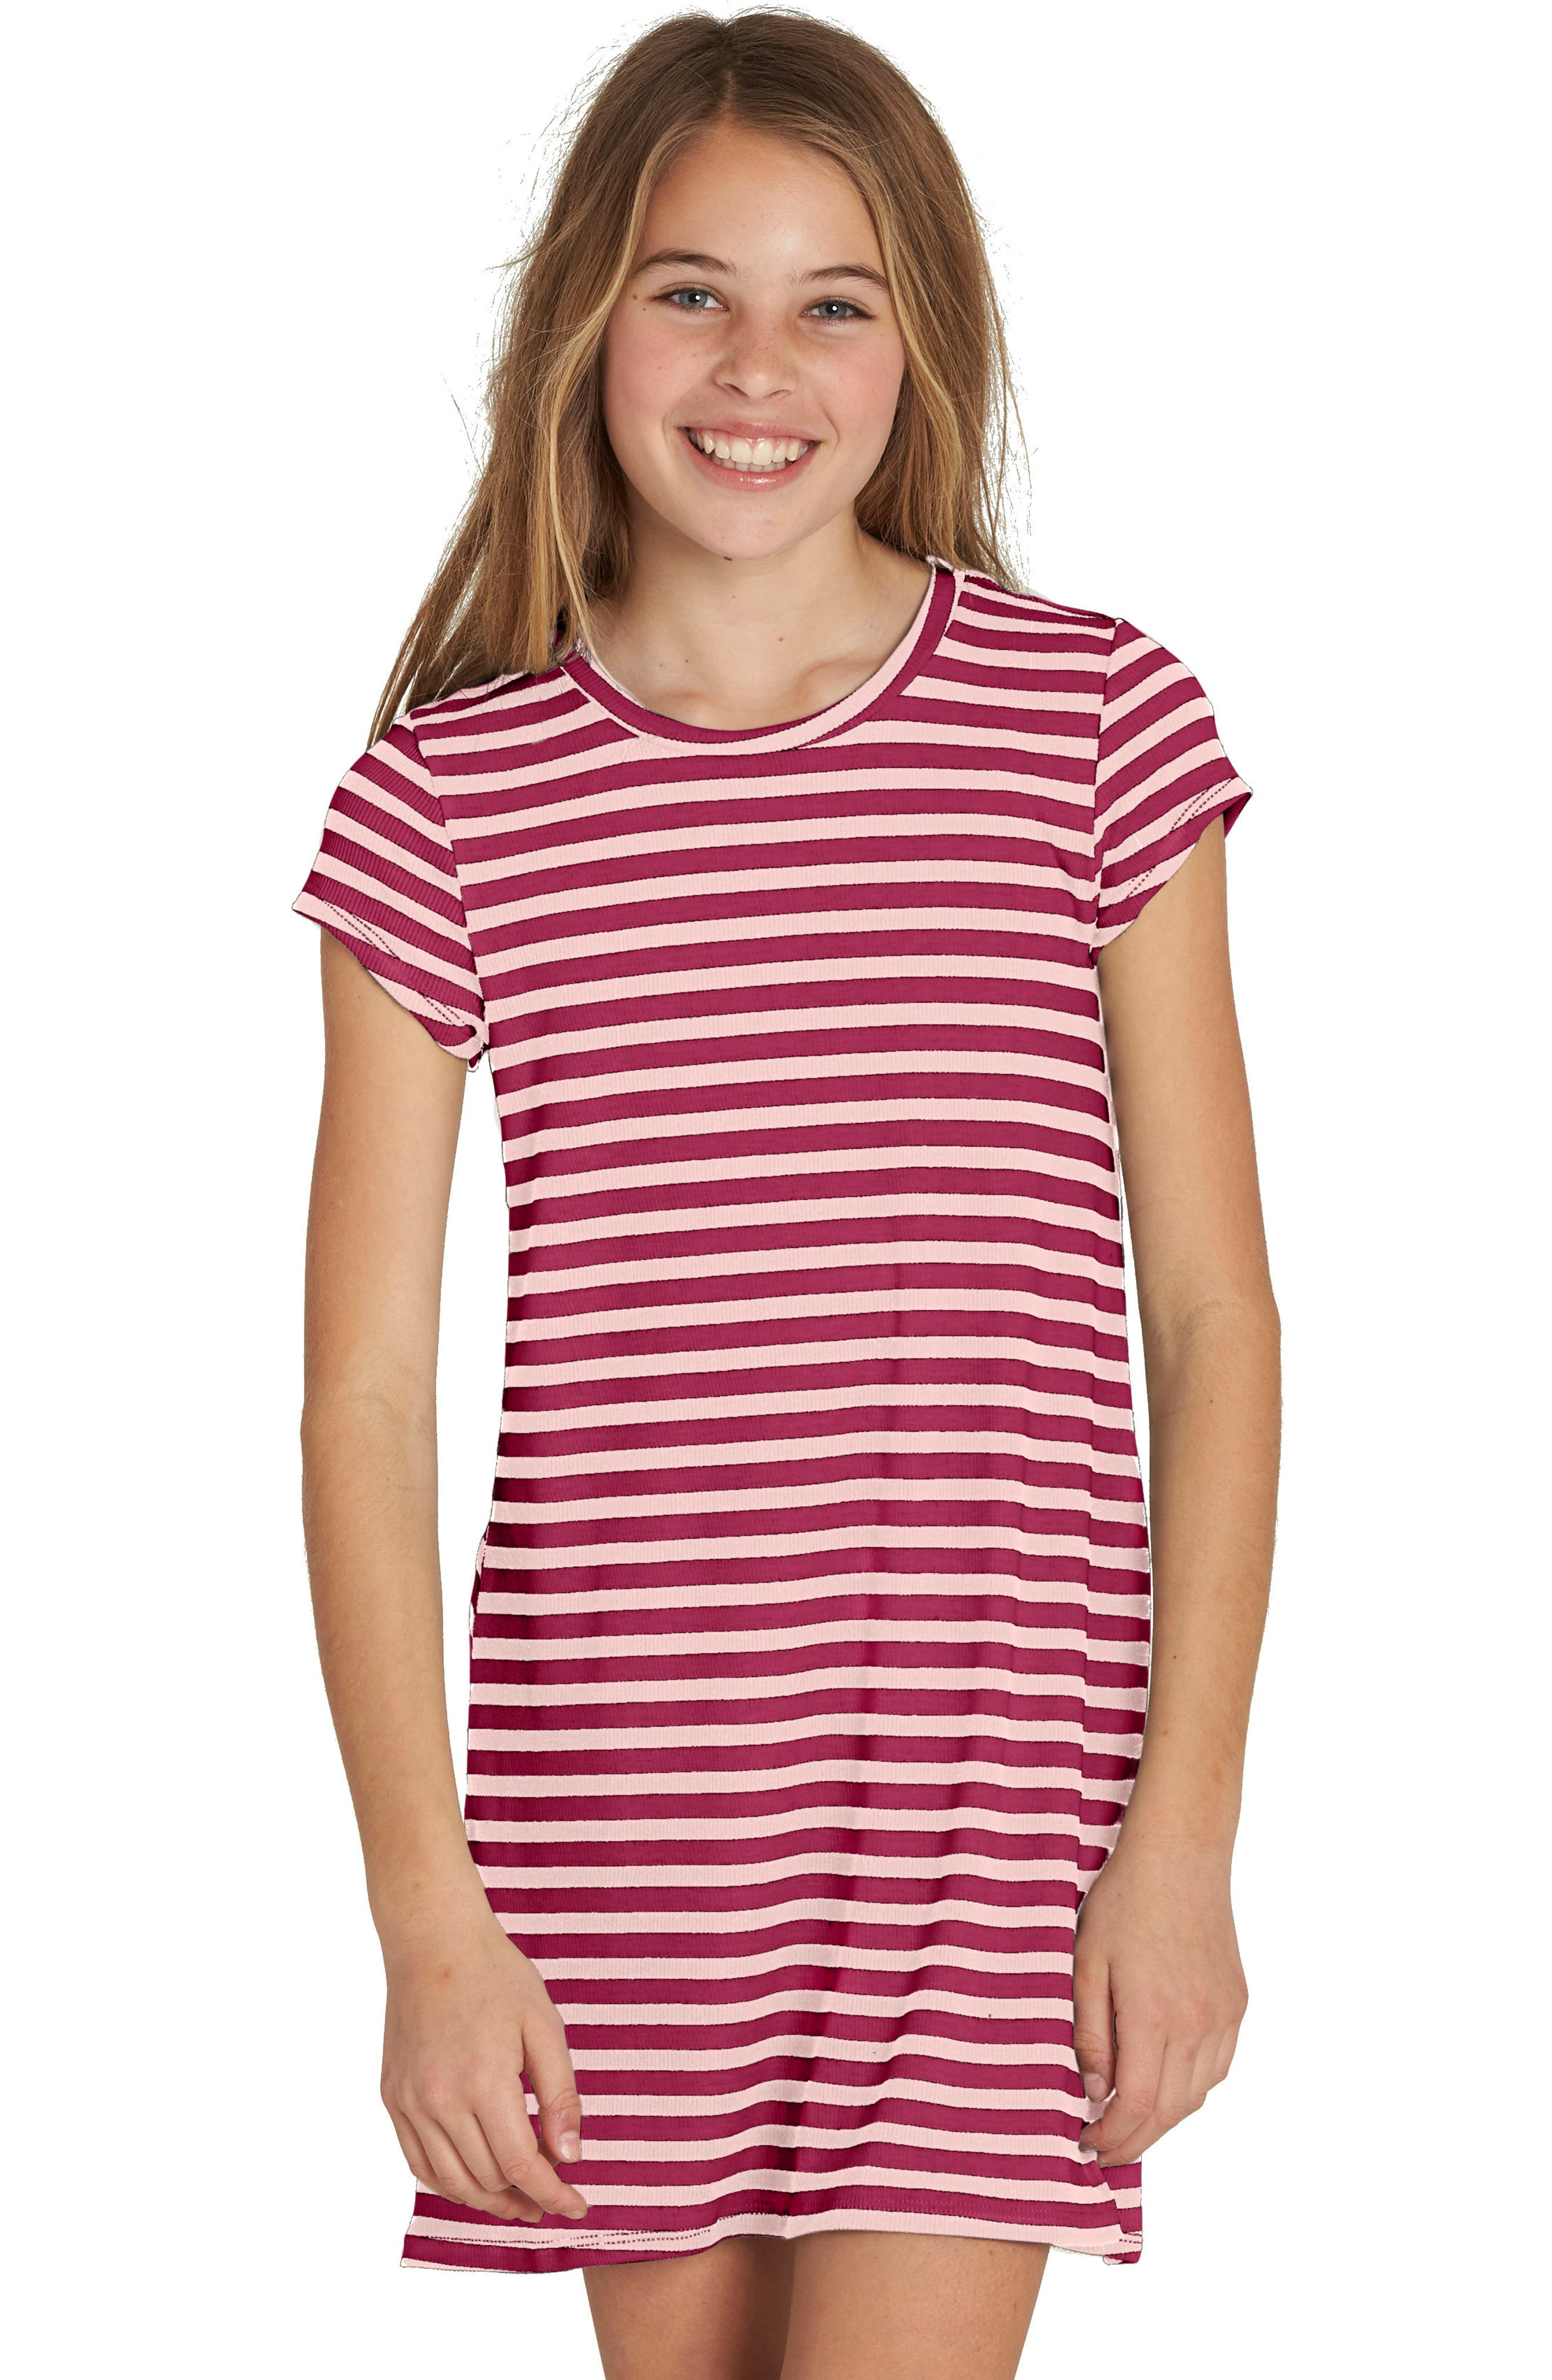 Alternate Image 1 Selected - Billabong Stripe Dress (Little Girls & Big Girls)